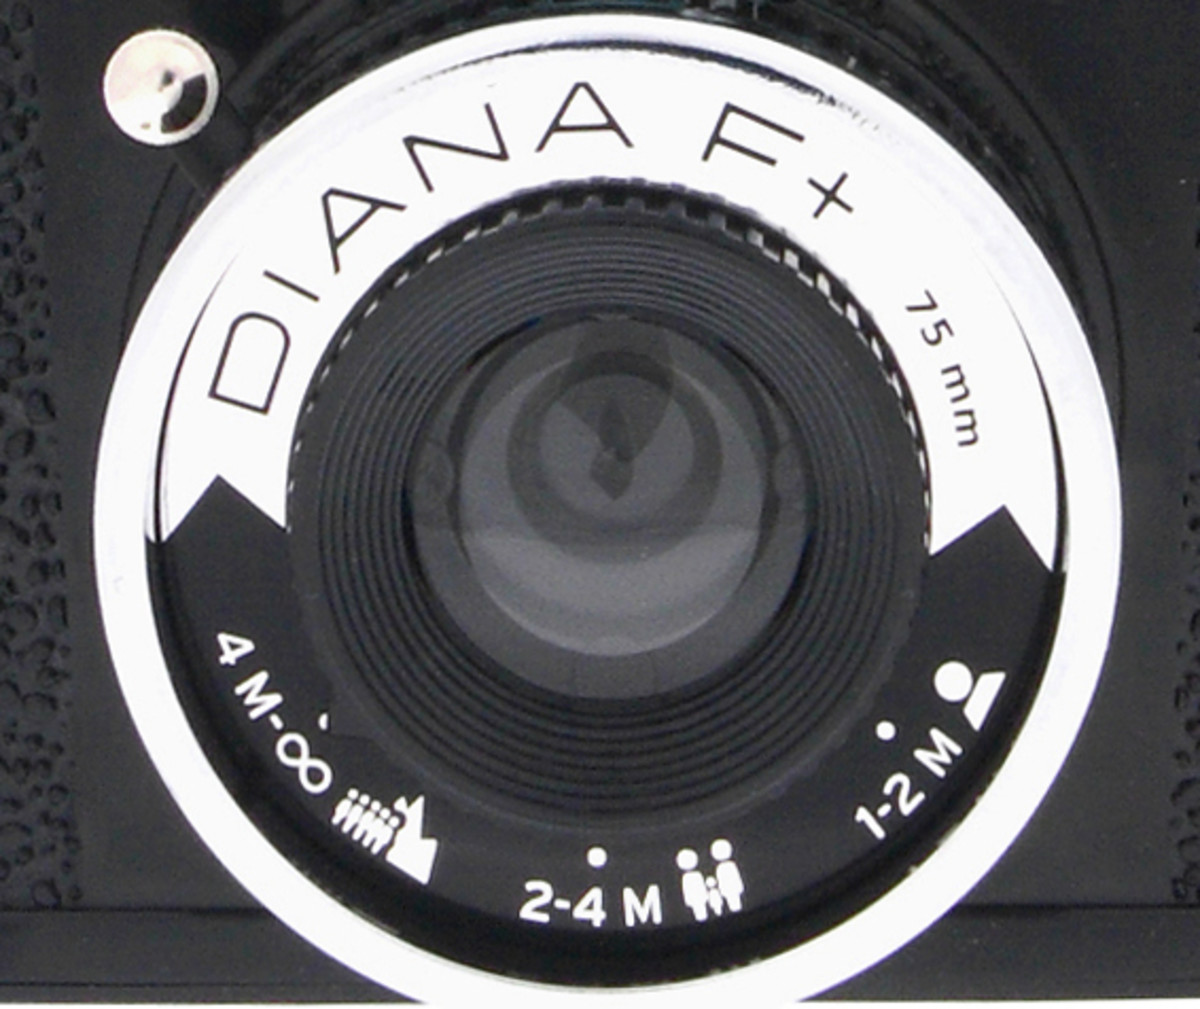 Focus settings on the Diana F+ camera